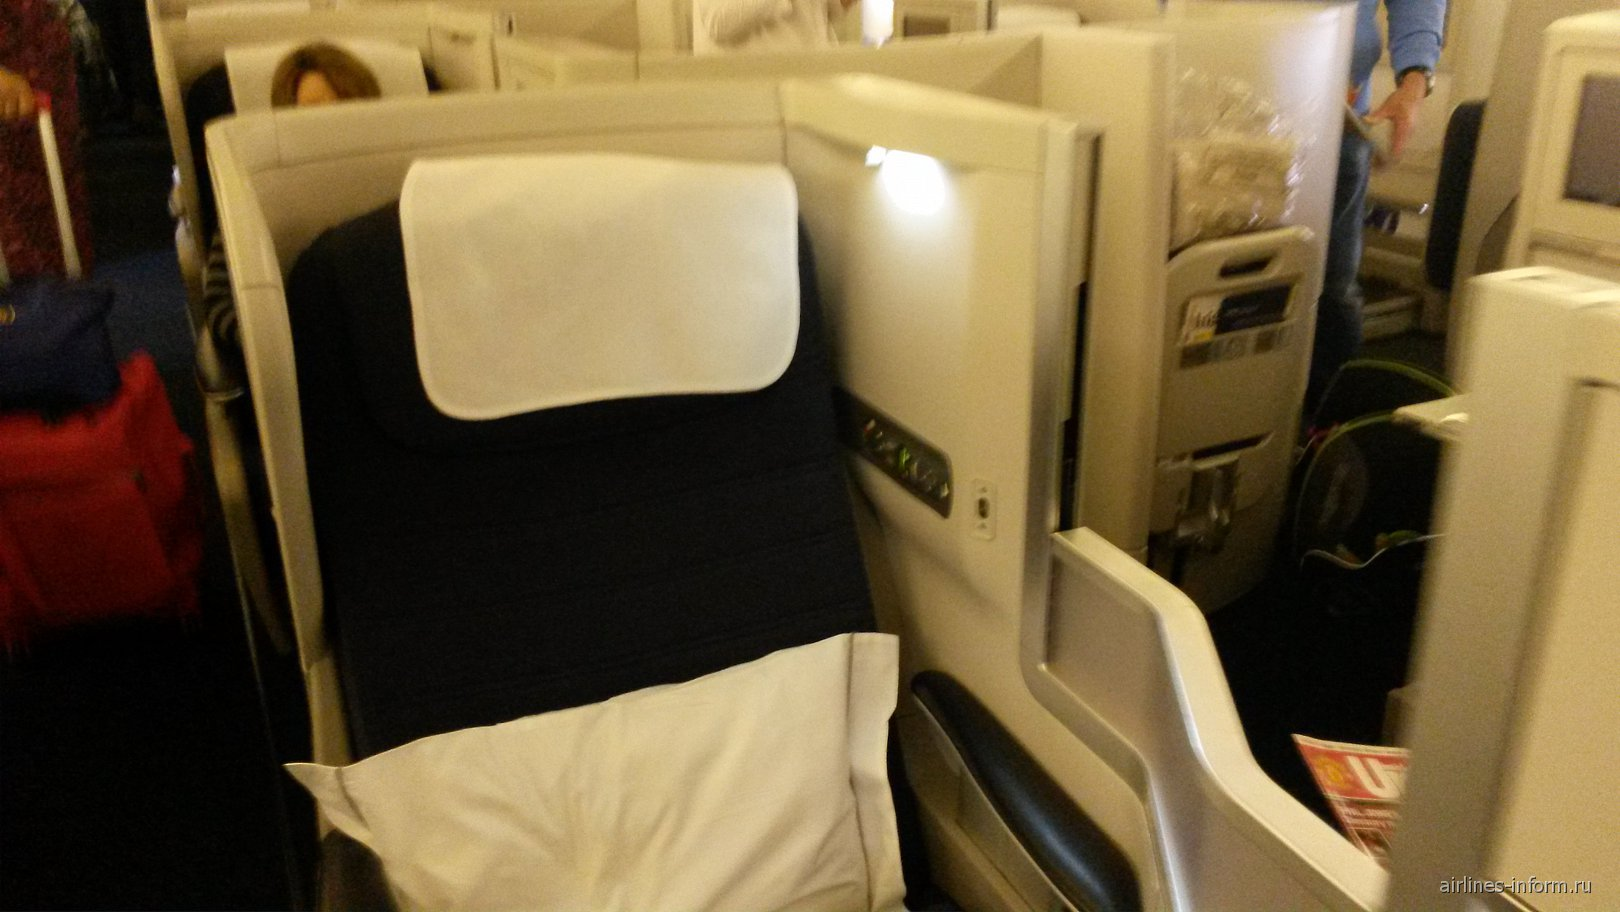 Салон самолета Боинг-747-400 Британских авиалиний